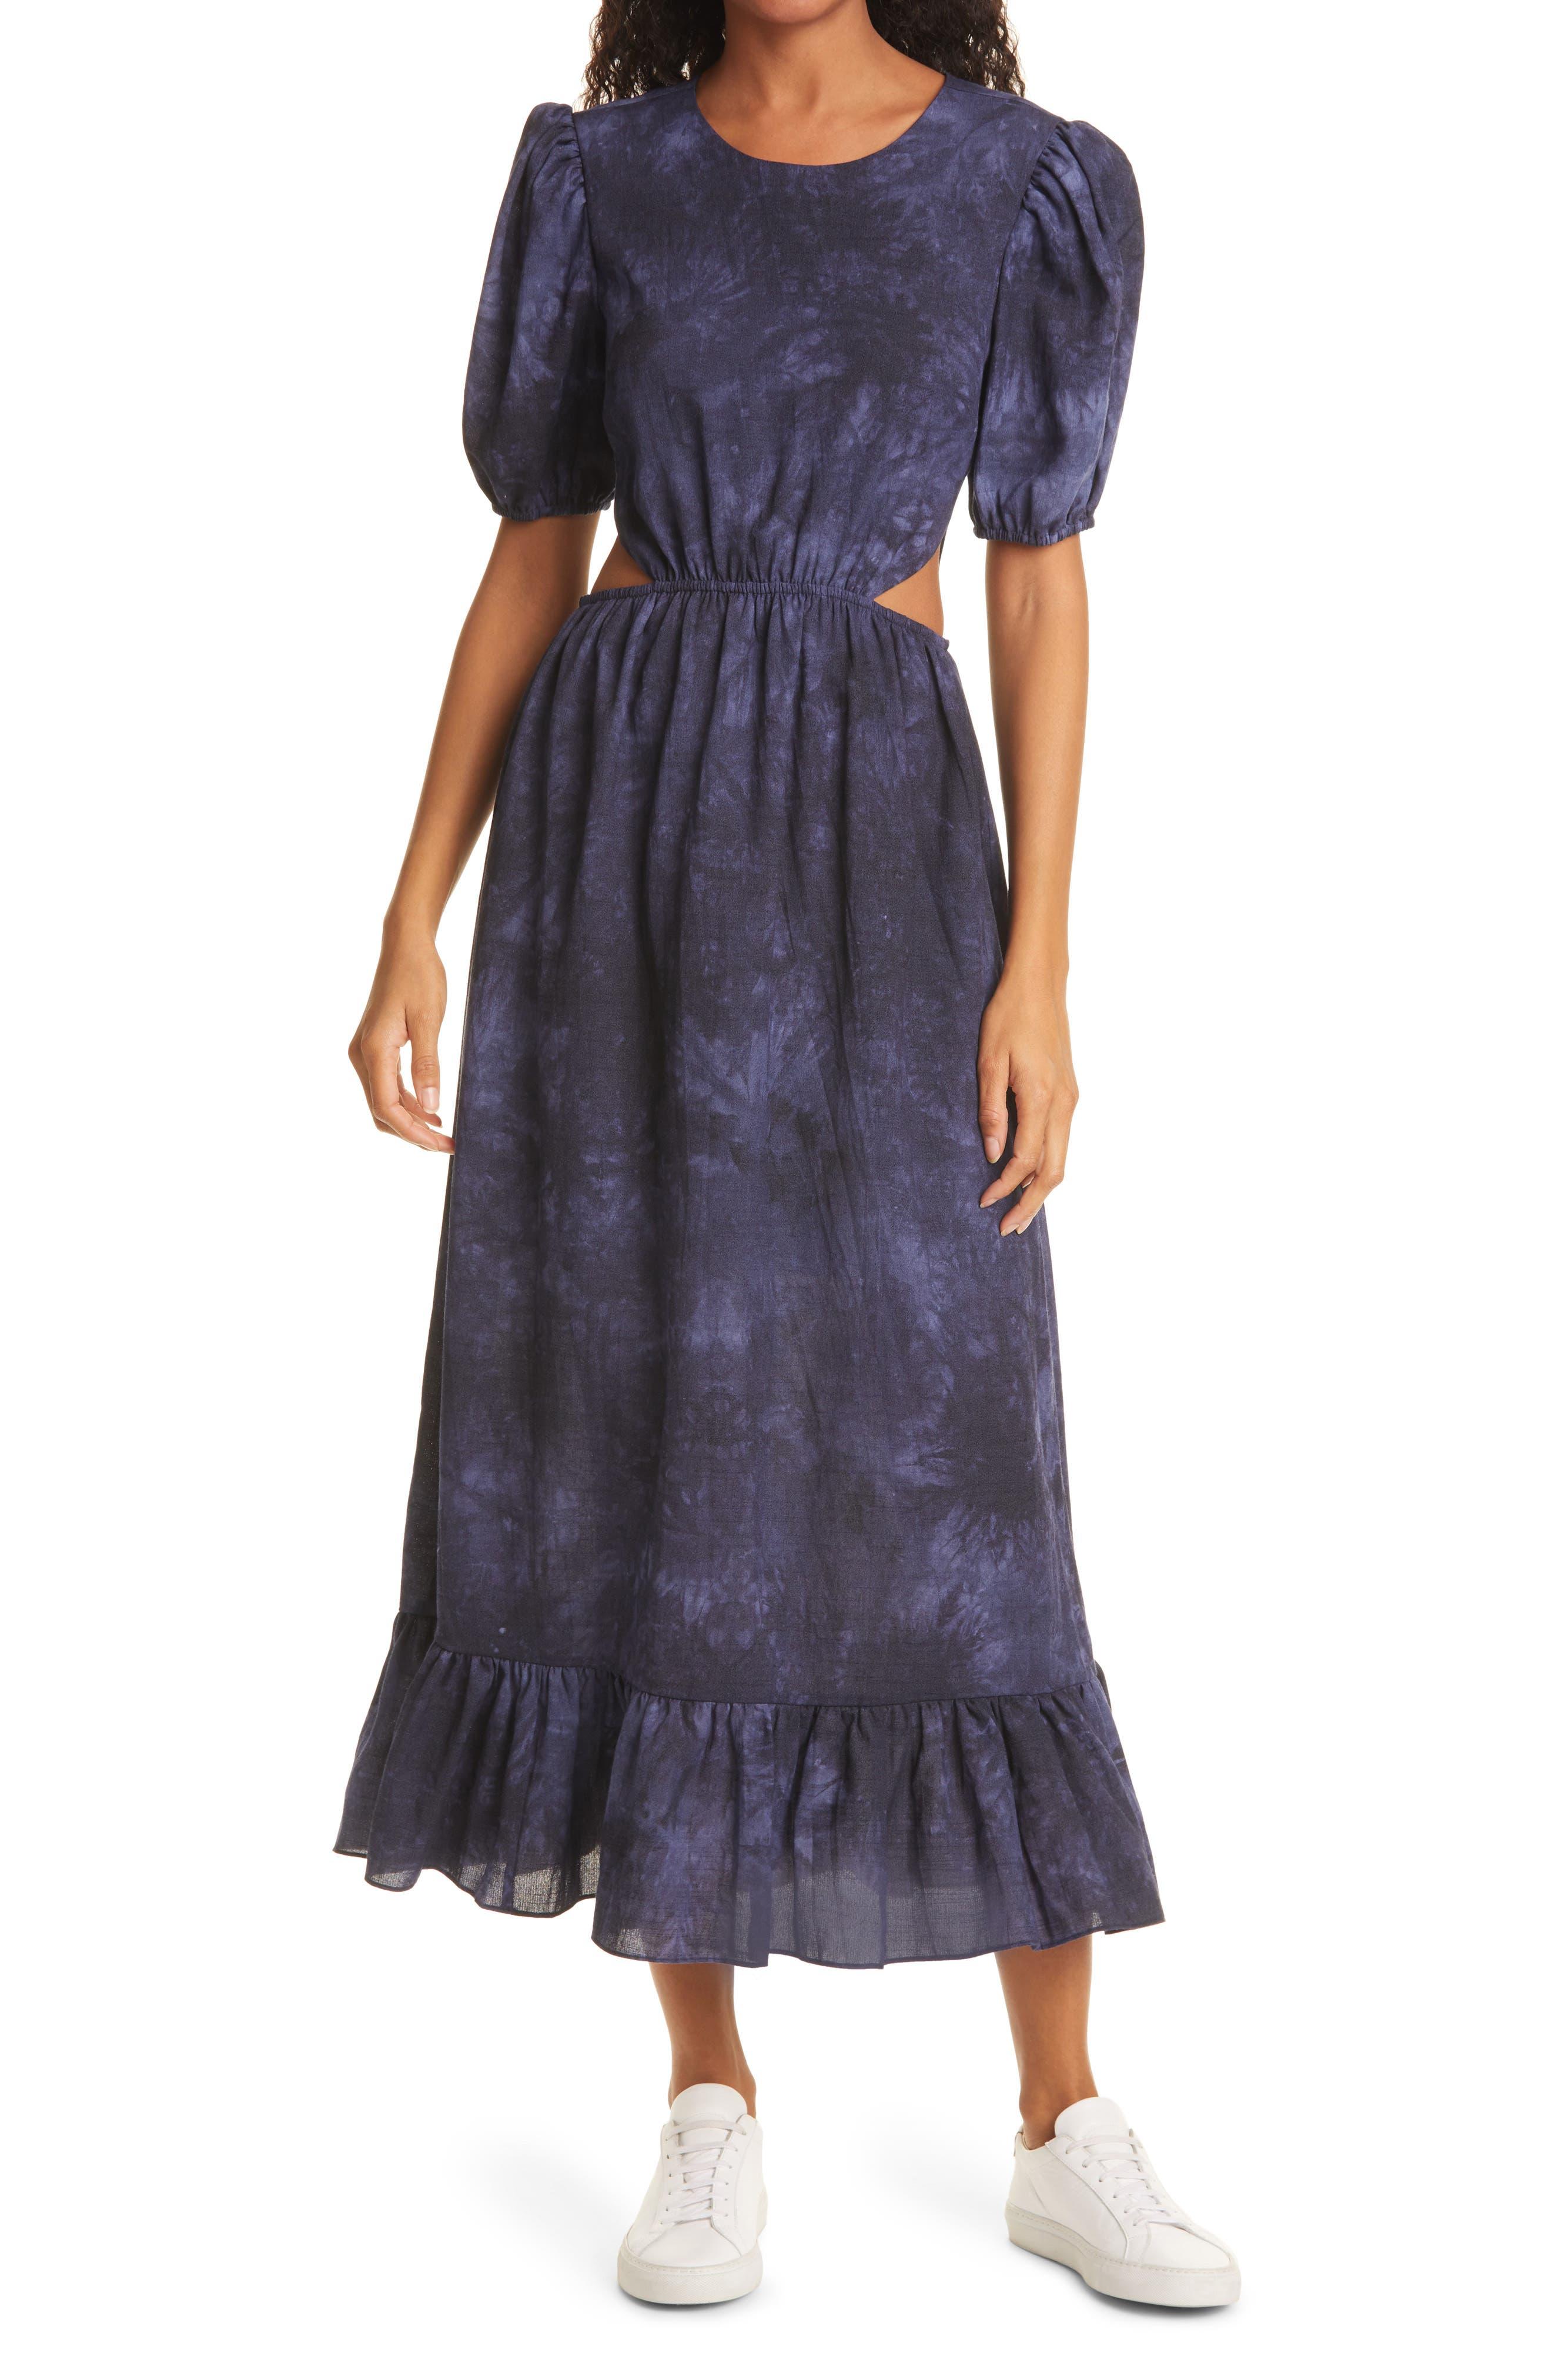 Rosa Tie Dye Midi Dress